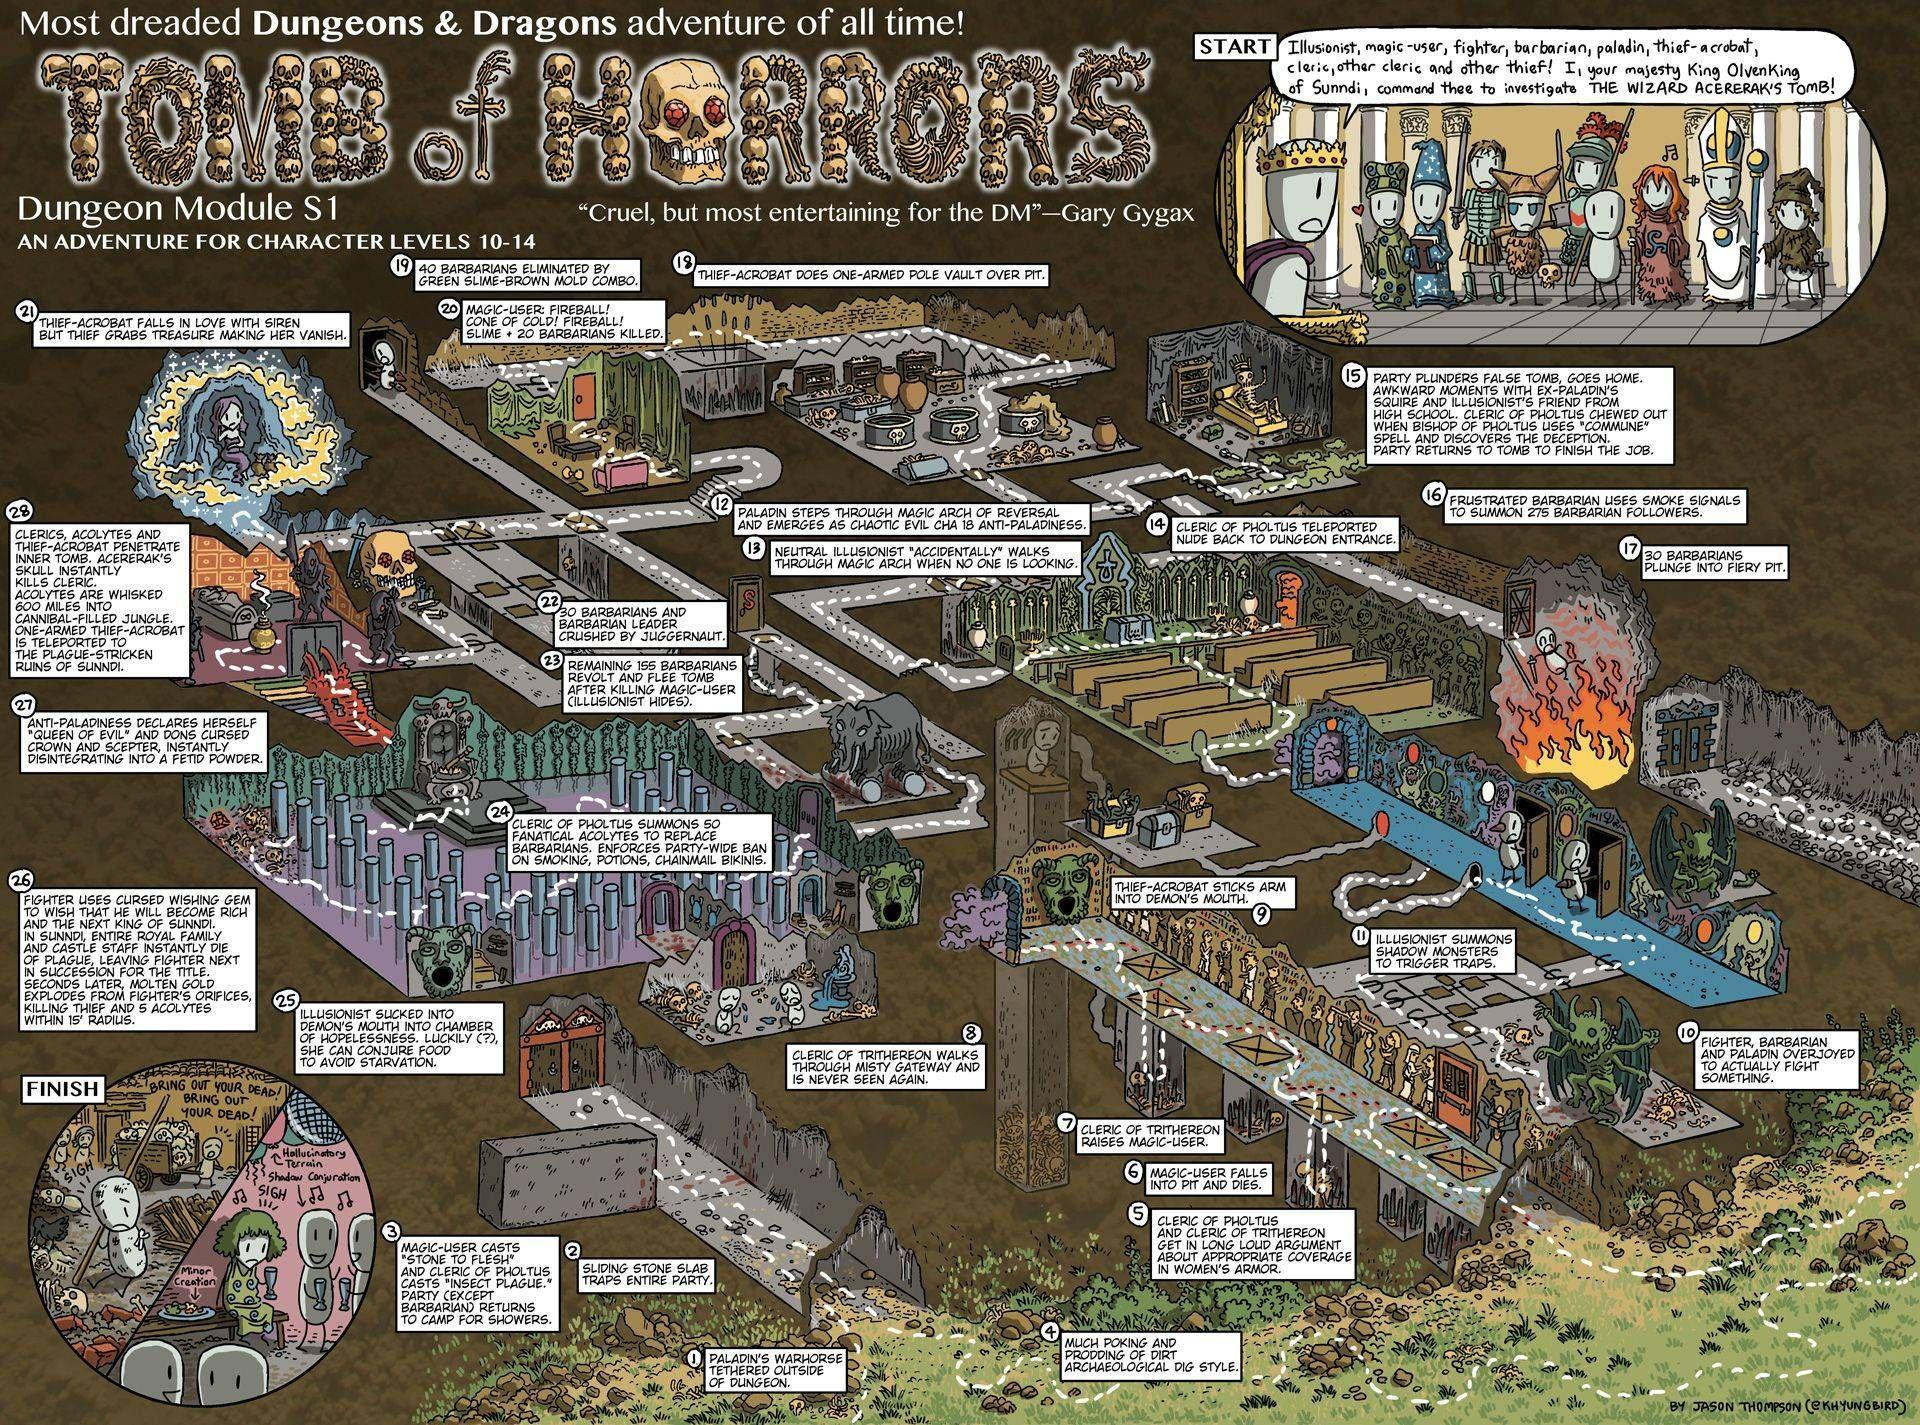 Classic DD Walkthrough Maps Album On Imgur Game Design - Us map dragon